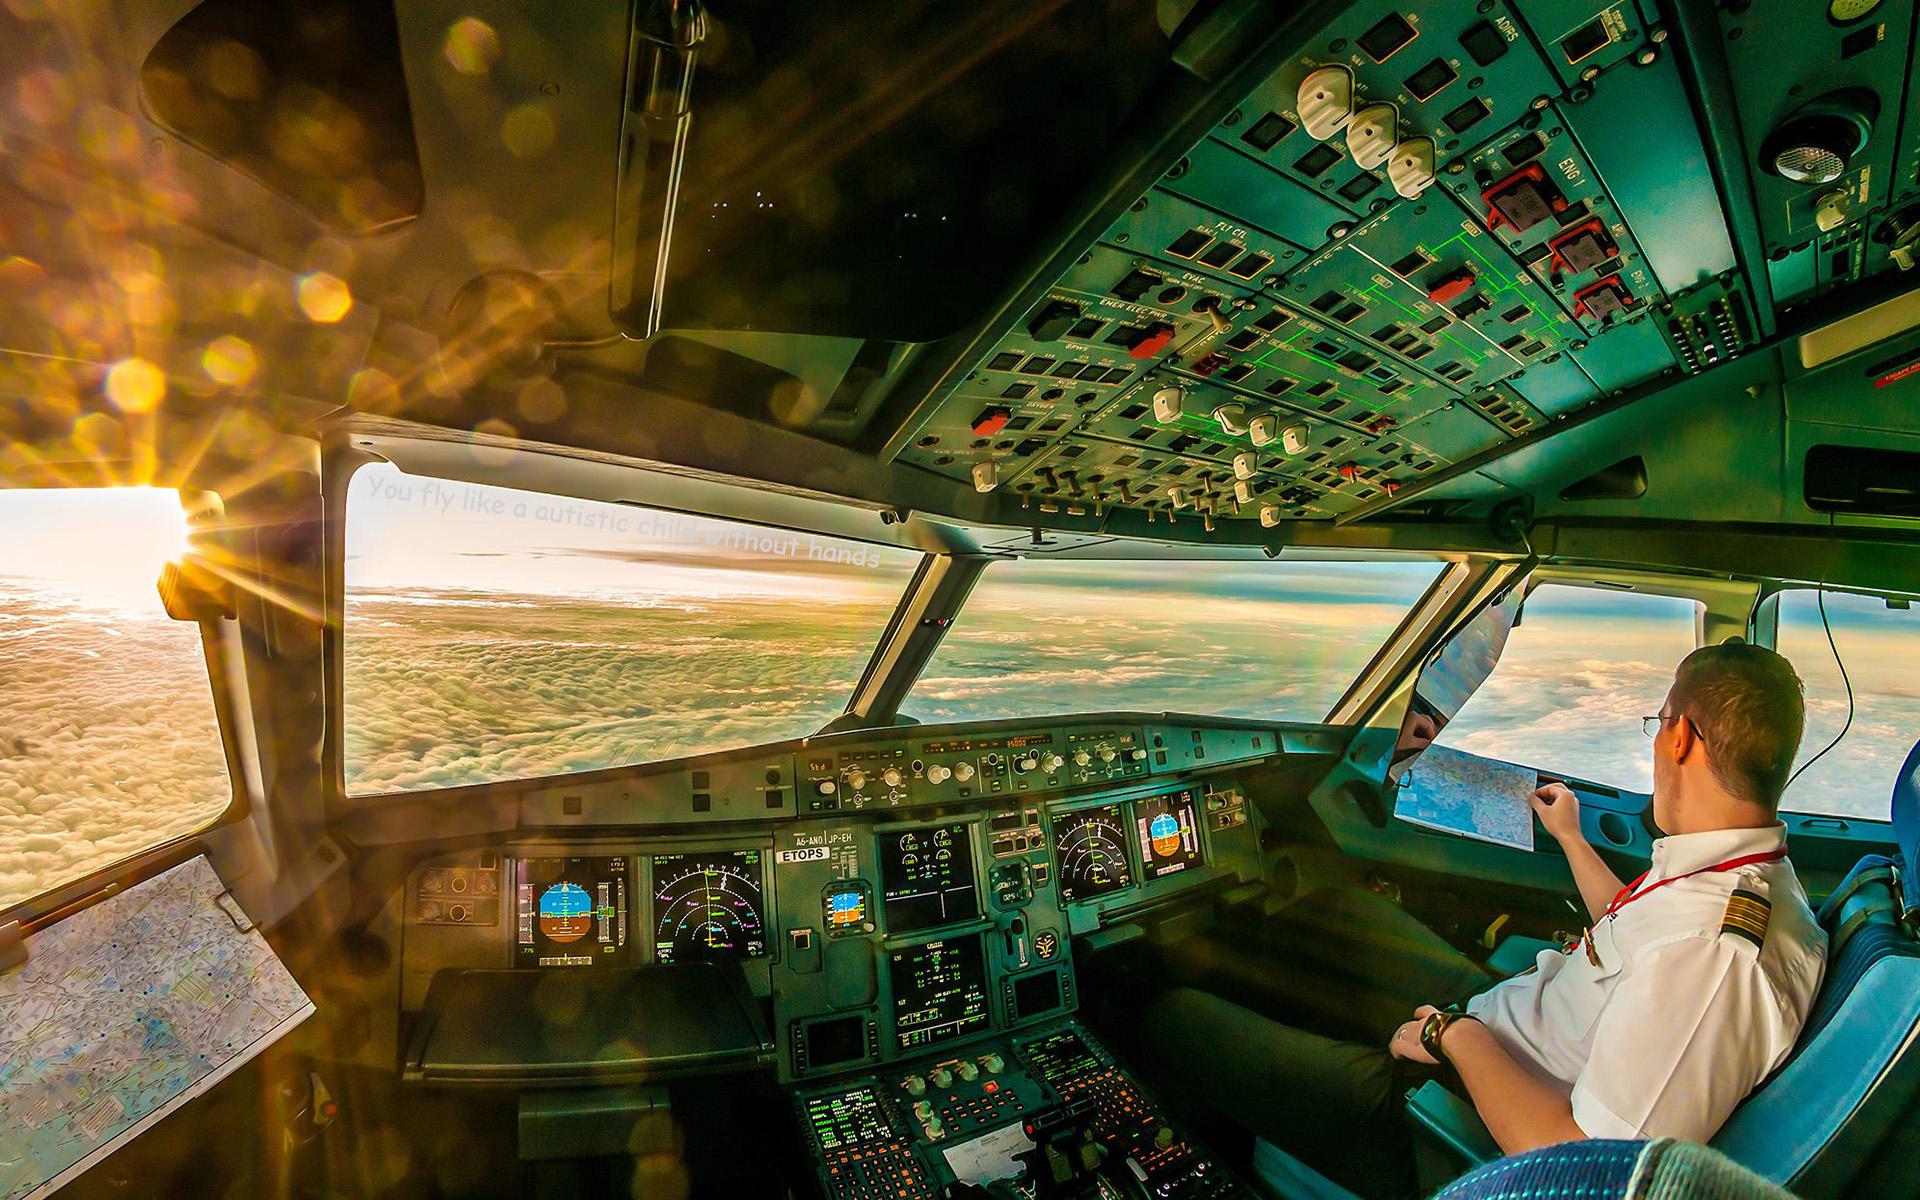 69 Airplane Cockpit Wallpaper On Wallpapersafari